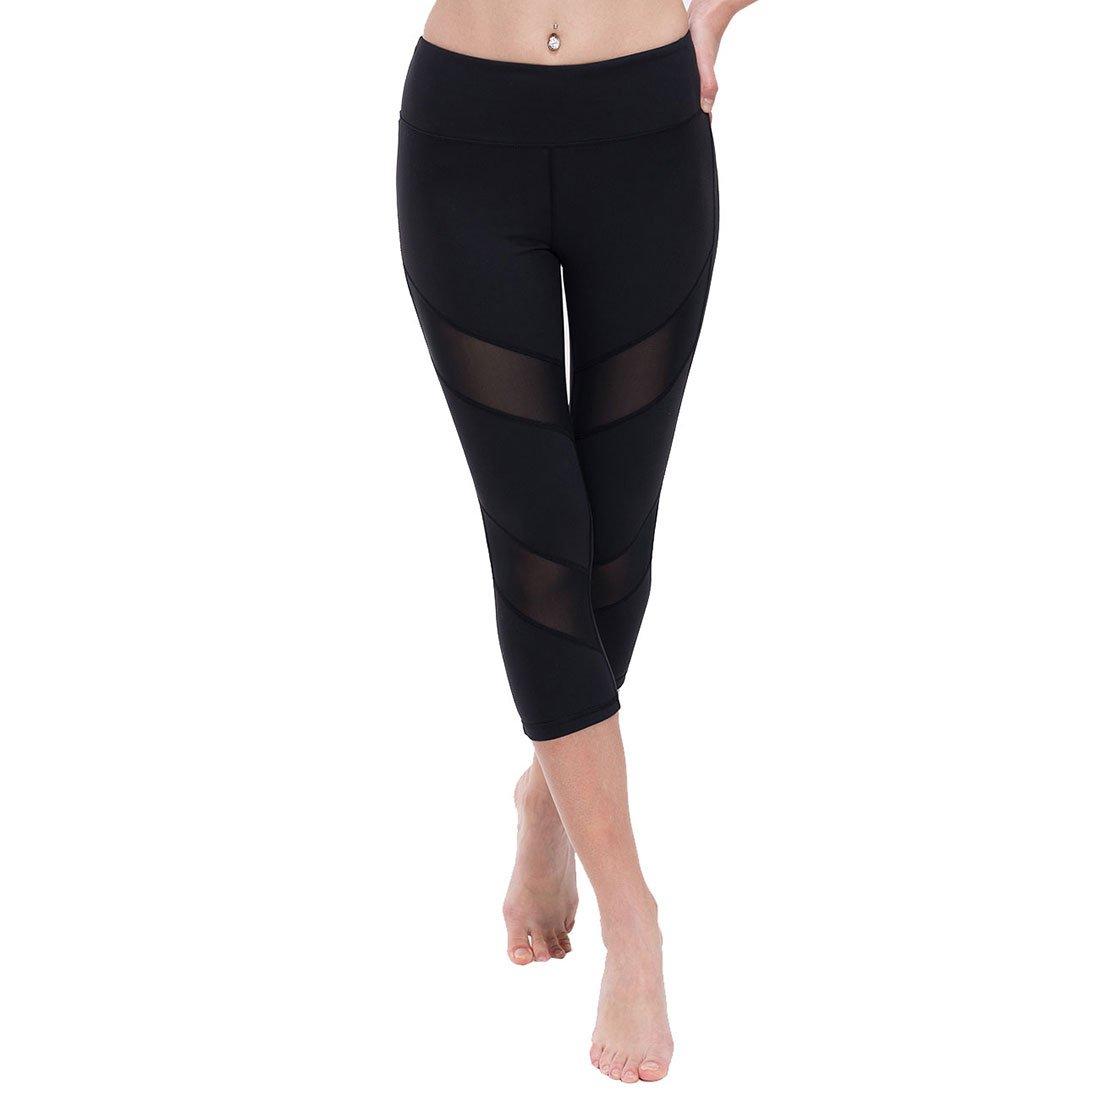 ONGASOFT Damen Capri-Leggings, Mesh-Training, Yoga-Hose mit Innentasche